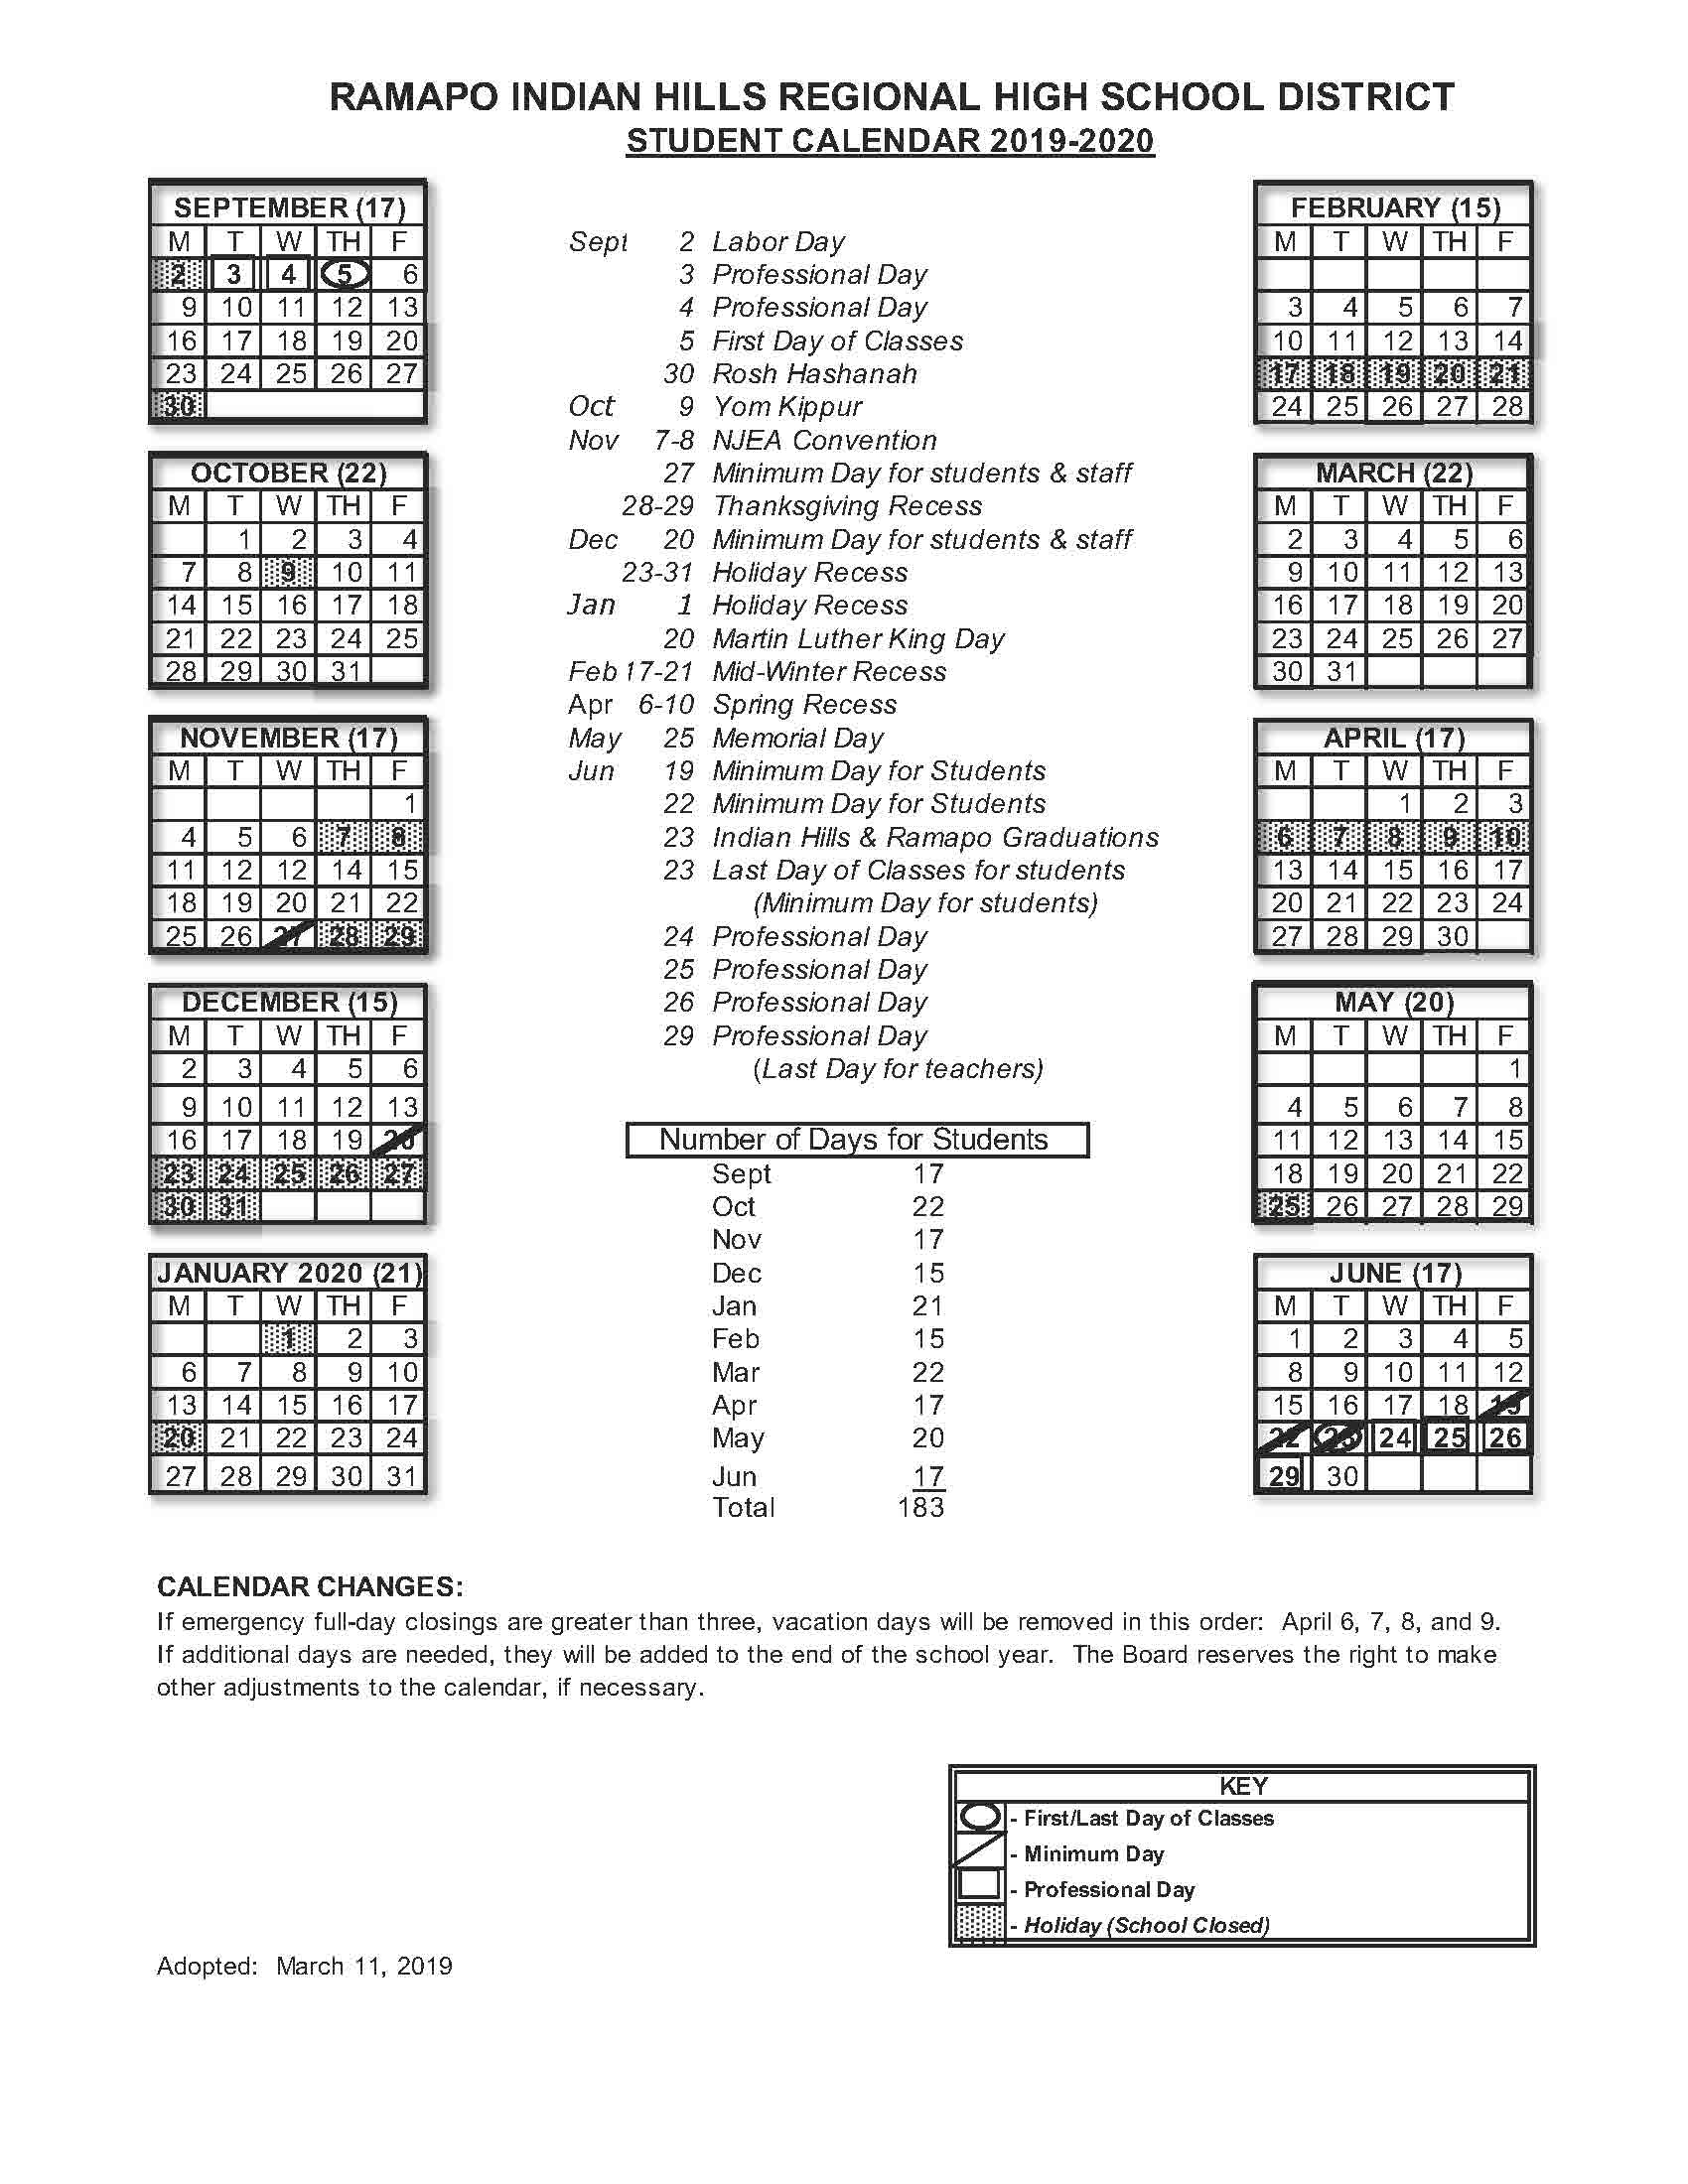 2019 2020 Student Calendar - Rihrhsd For Spring Valley Ny Hs Calendar